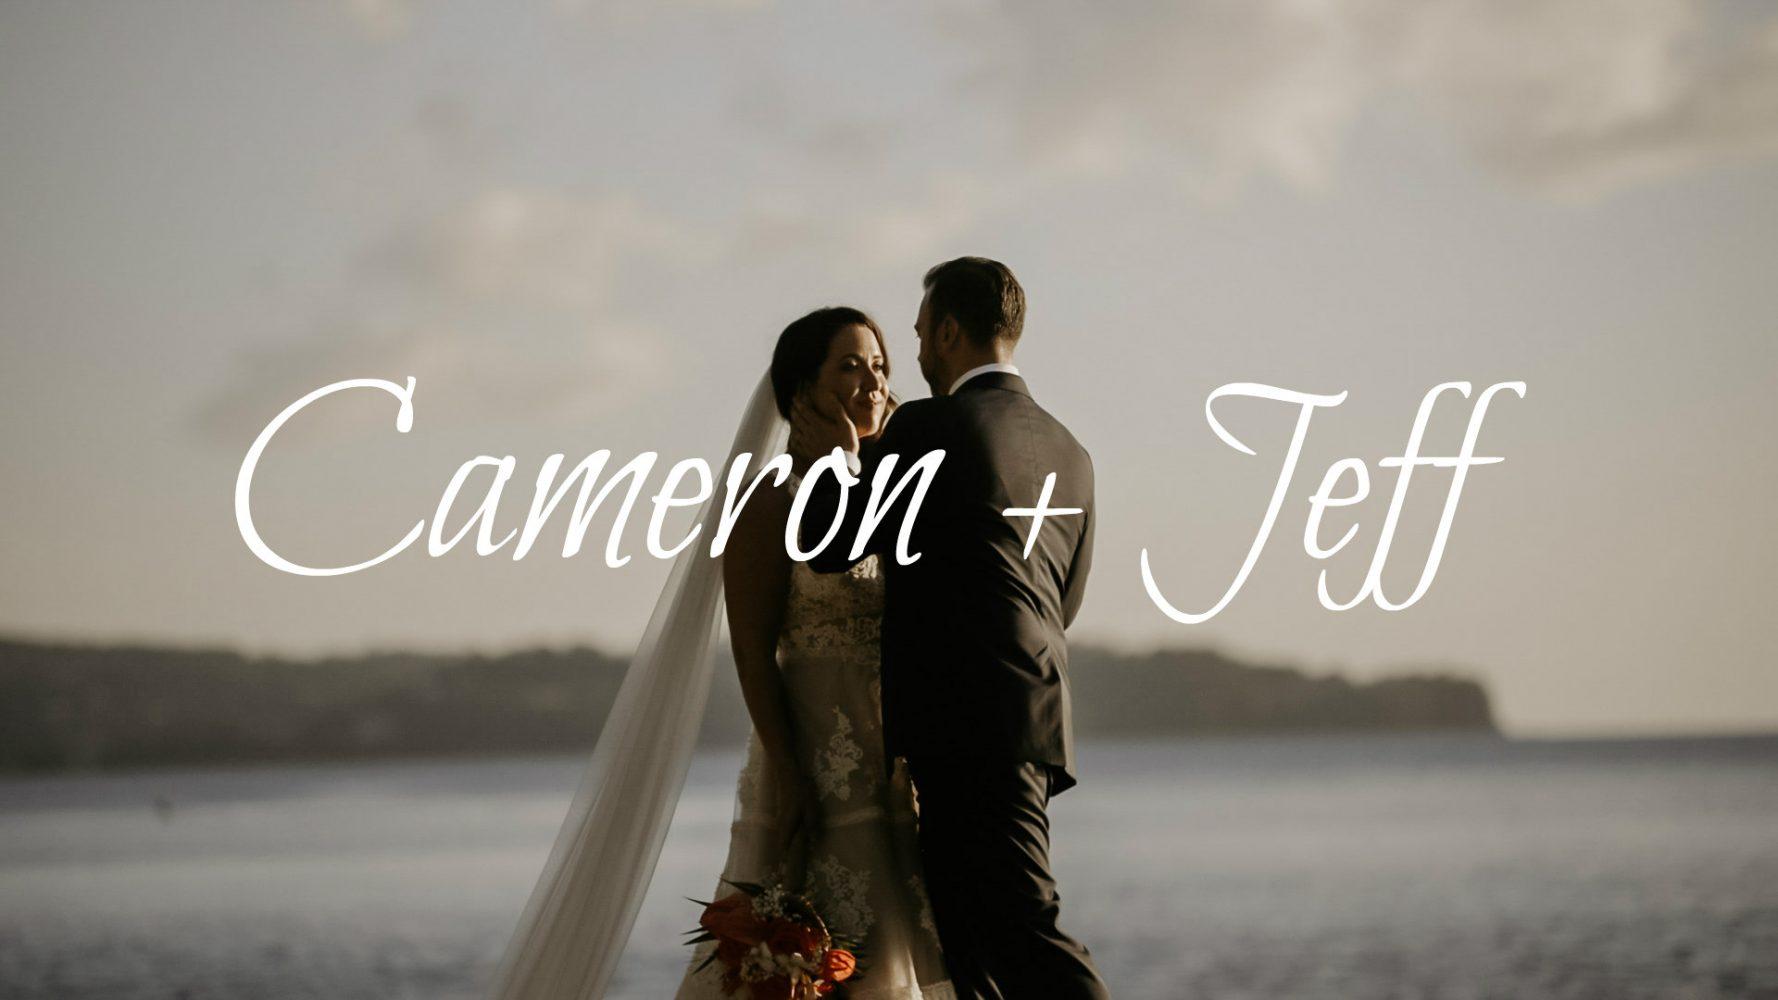 Cameron + Jeff   Labrelotte Bay, Saint Lucia   Labrelotte Bay Labrelotte Bay Castries, St Lucia